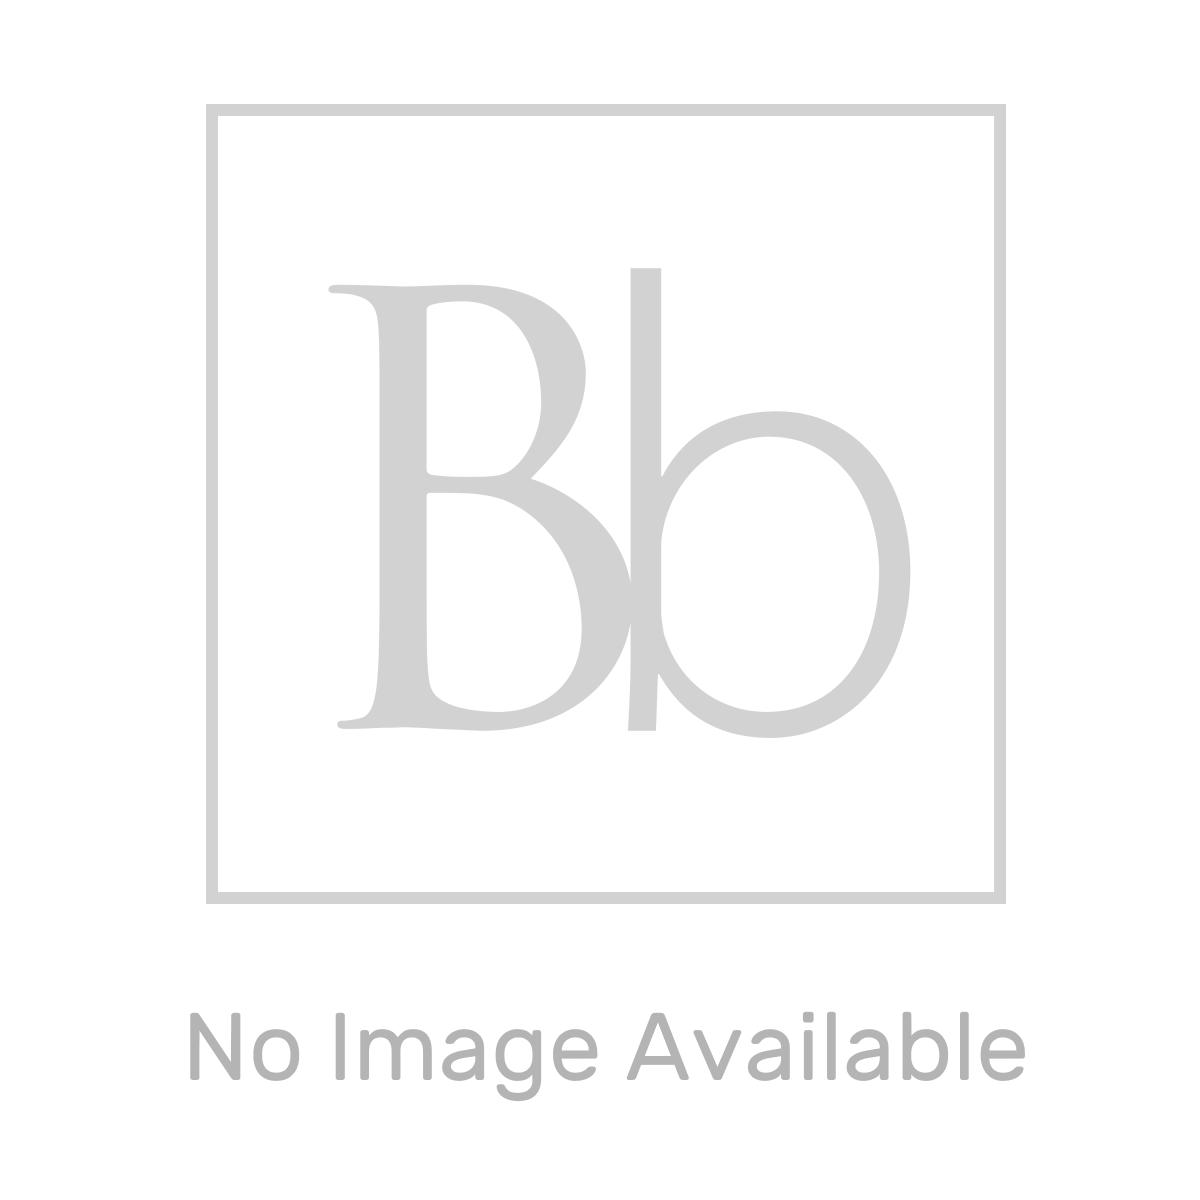 Nuie Blocks Satin Blue 2 Door/1 Drawer Floor Standing Vanity Unit with 18mm Profile Basin 600mm